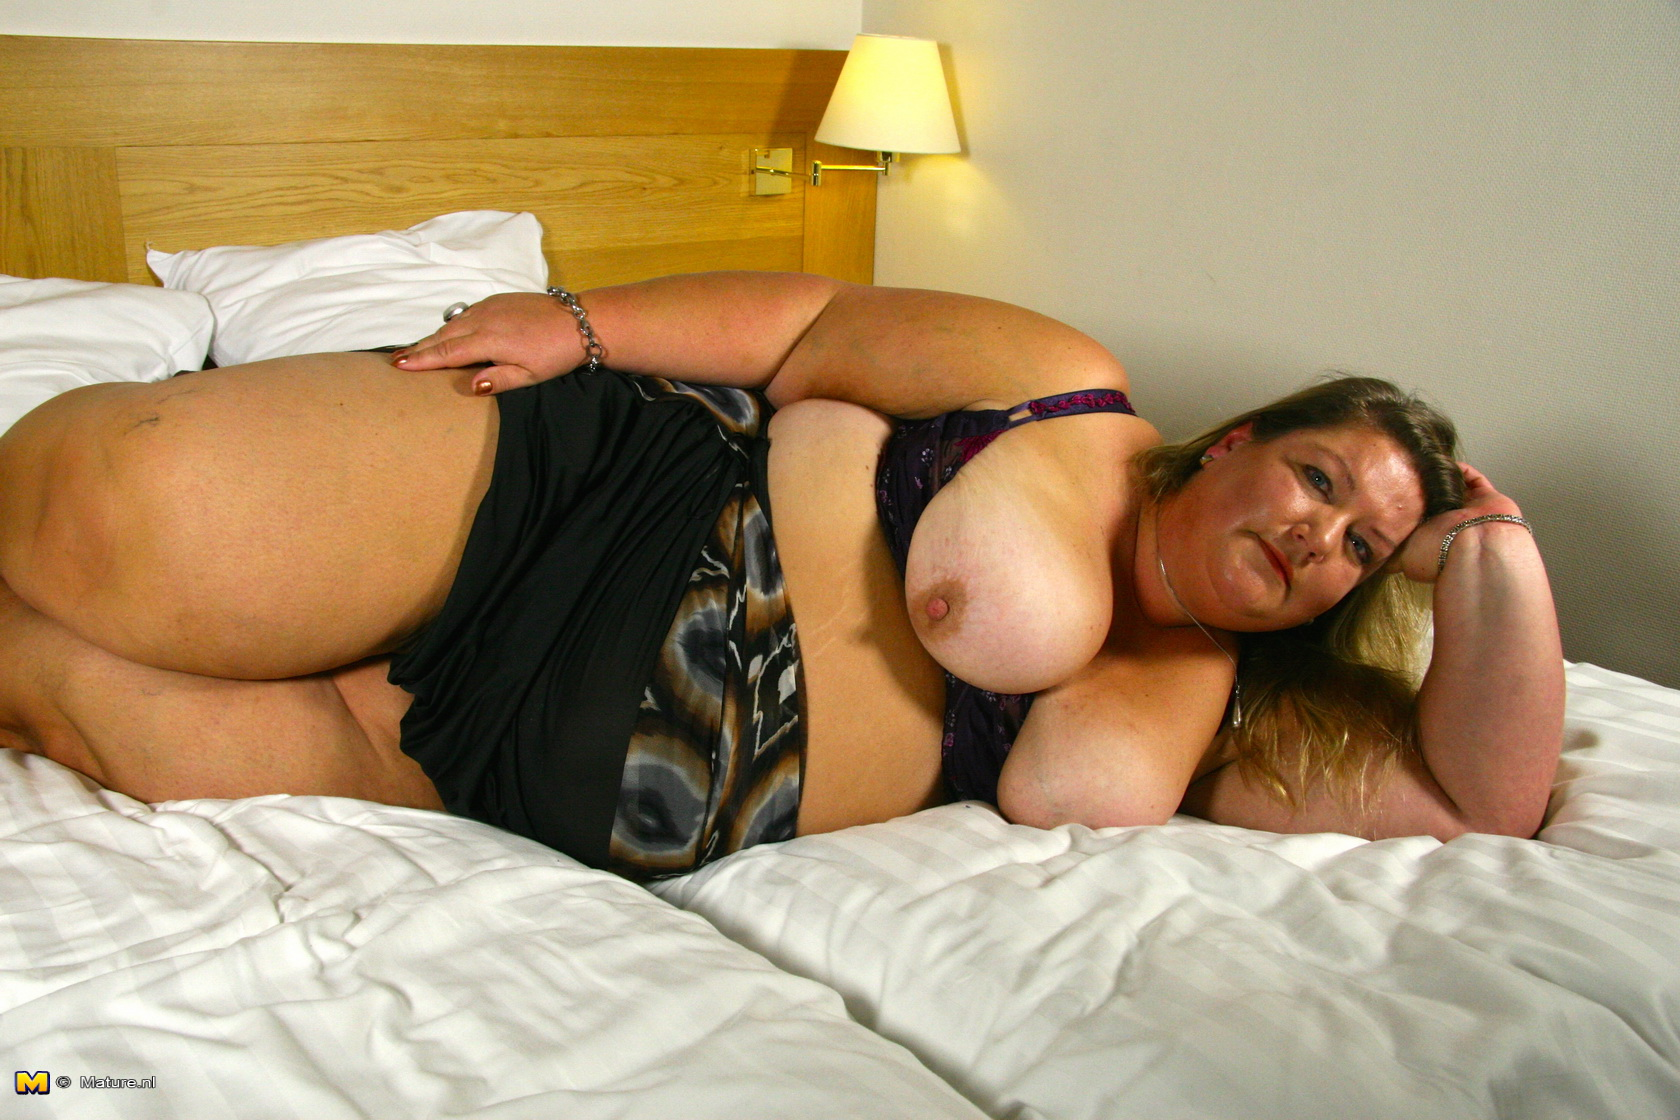 Women that love tits